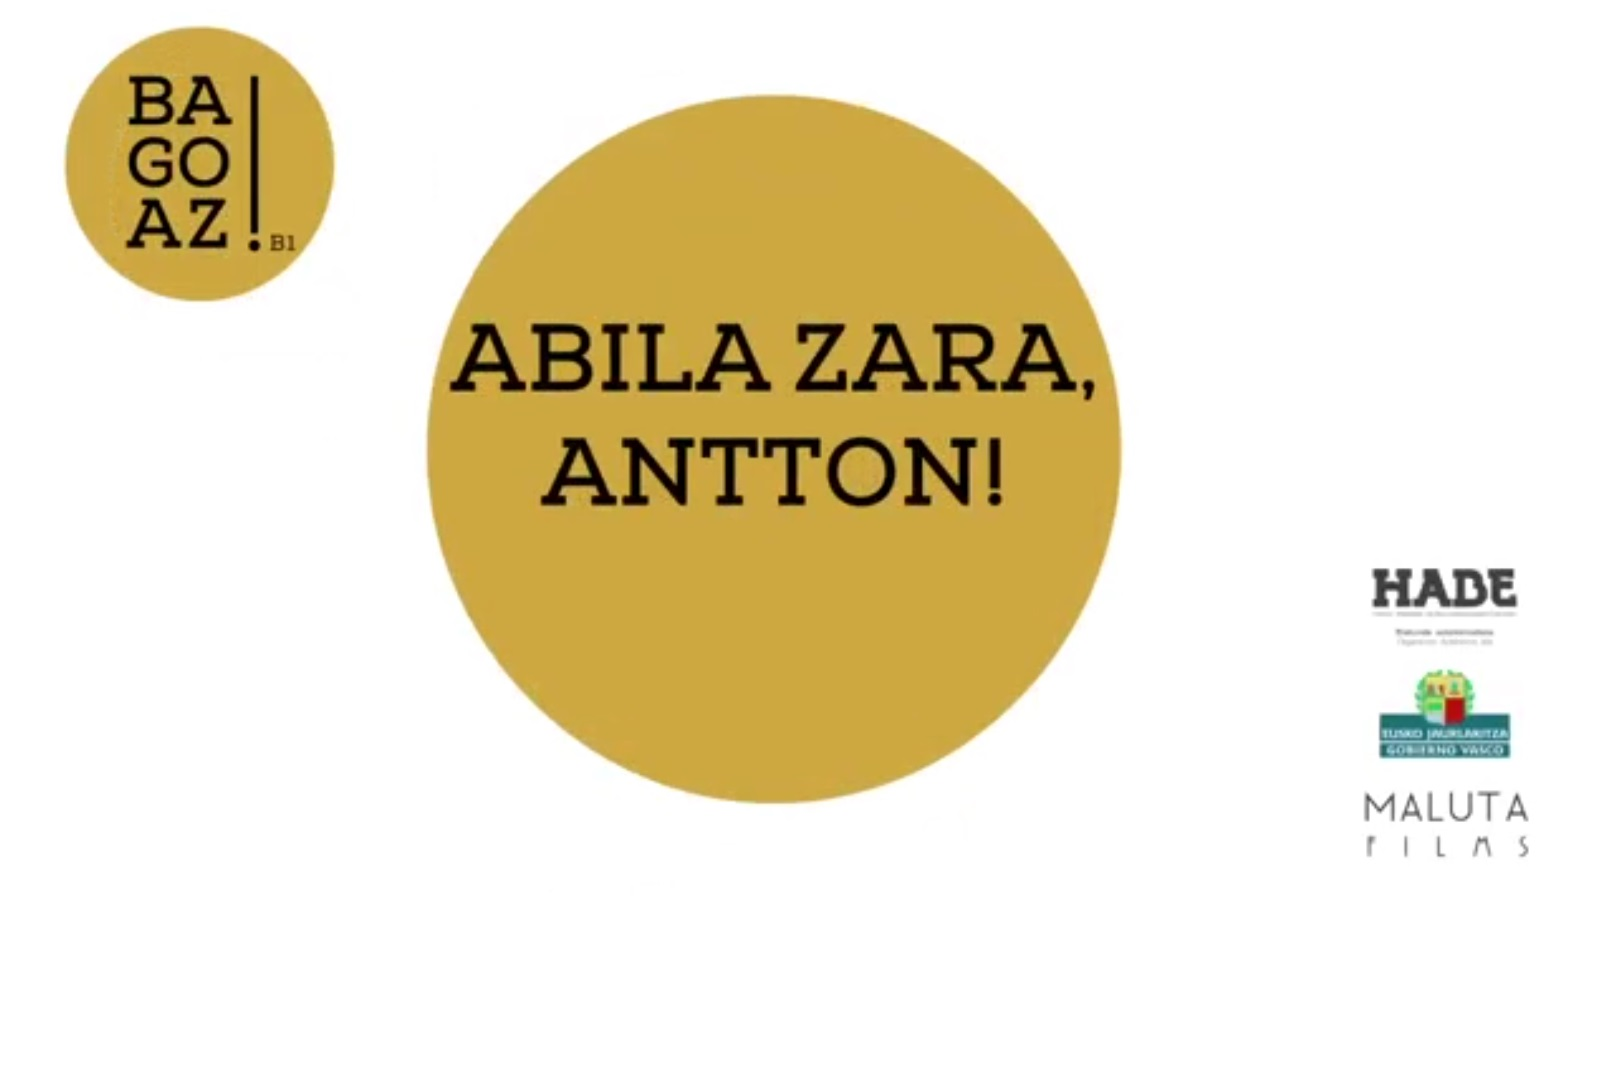 BAGOAZ! B1-50-Abila zara, Antton!